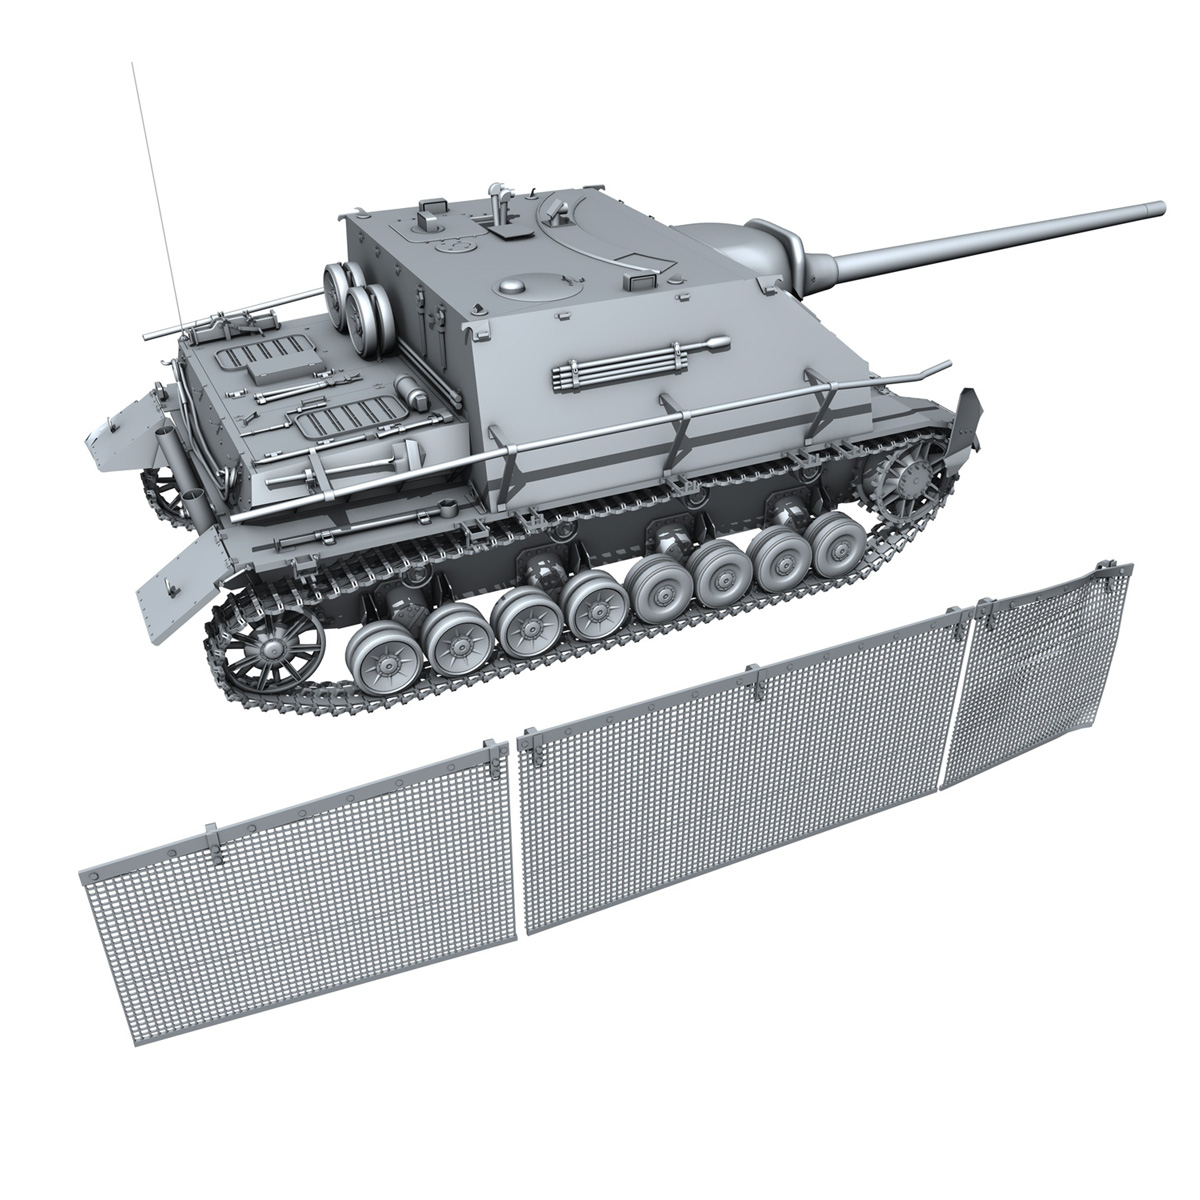 jagdpanzer iv l/70 (a) – sd.kfz 162/1 3d model 3ds fbx c4d lwo obj 202014